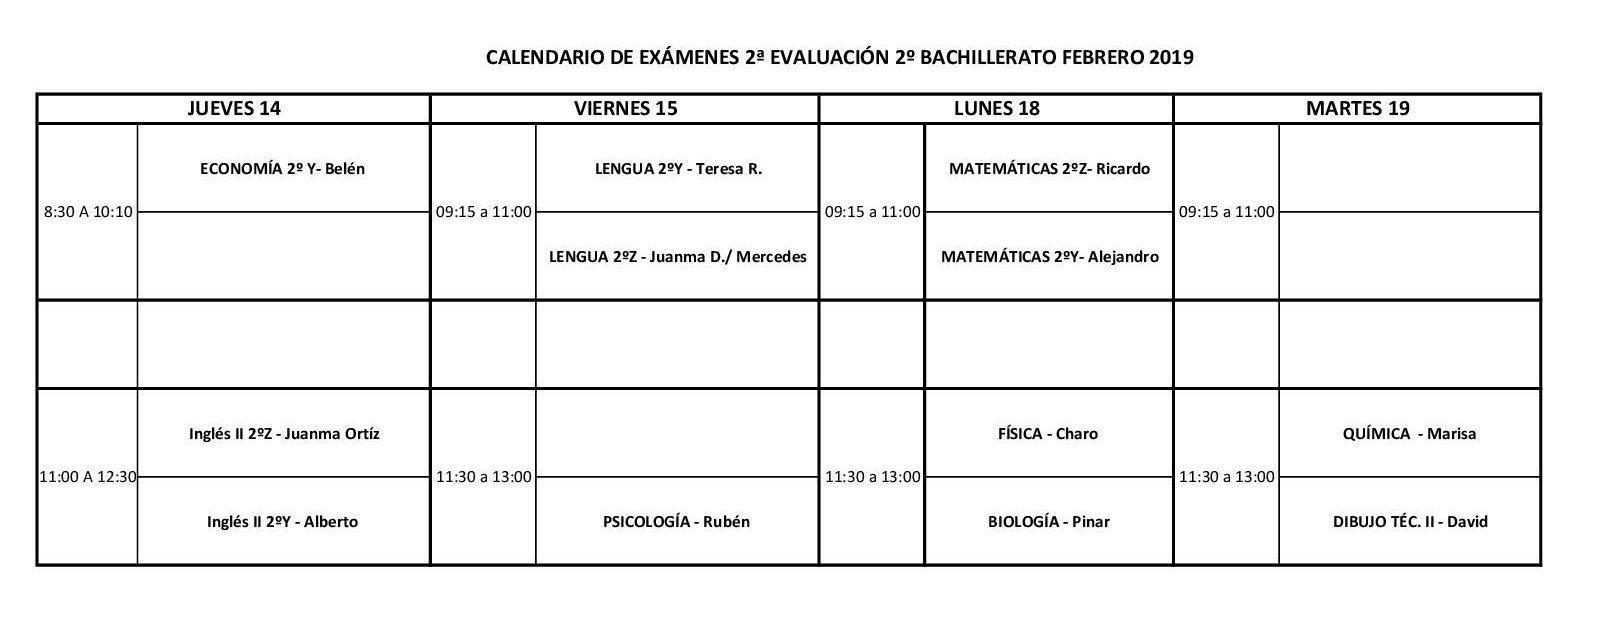 Calendario De Examenes.Calendario Examenes 2º De Bachillerato 2ª Evaluacion Web Ies